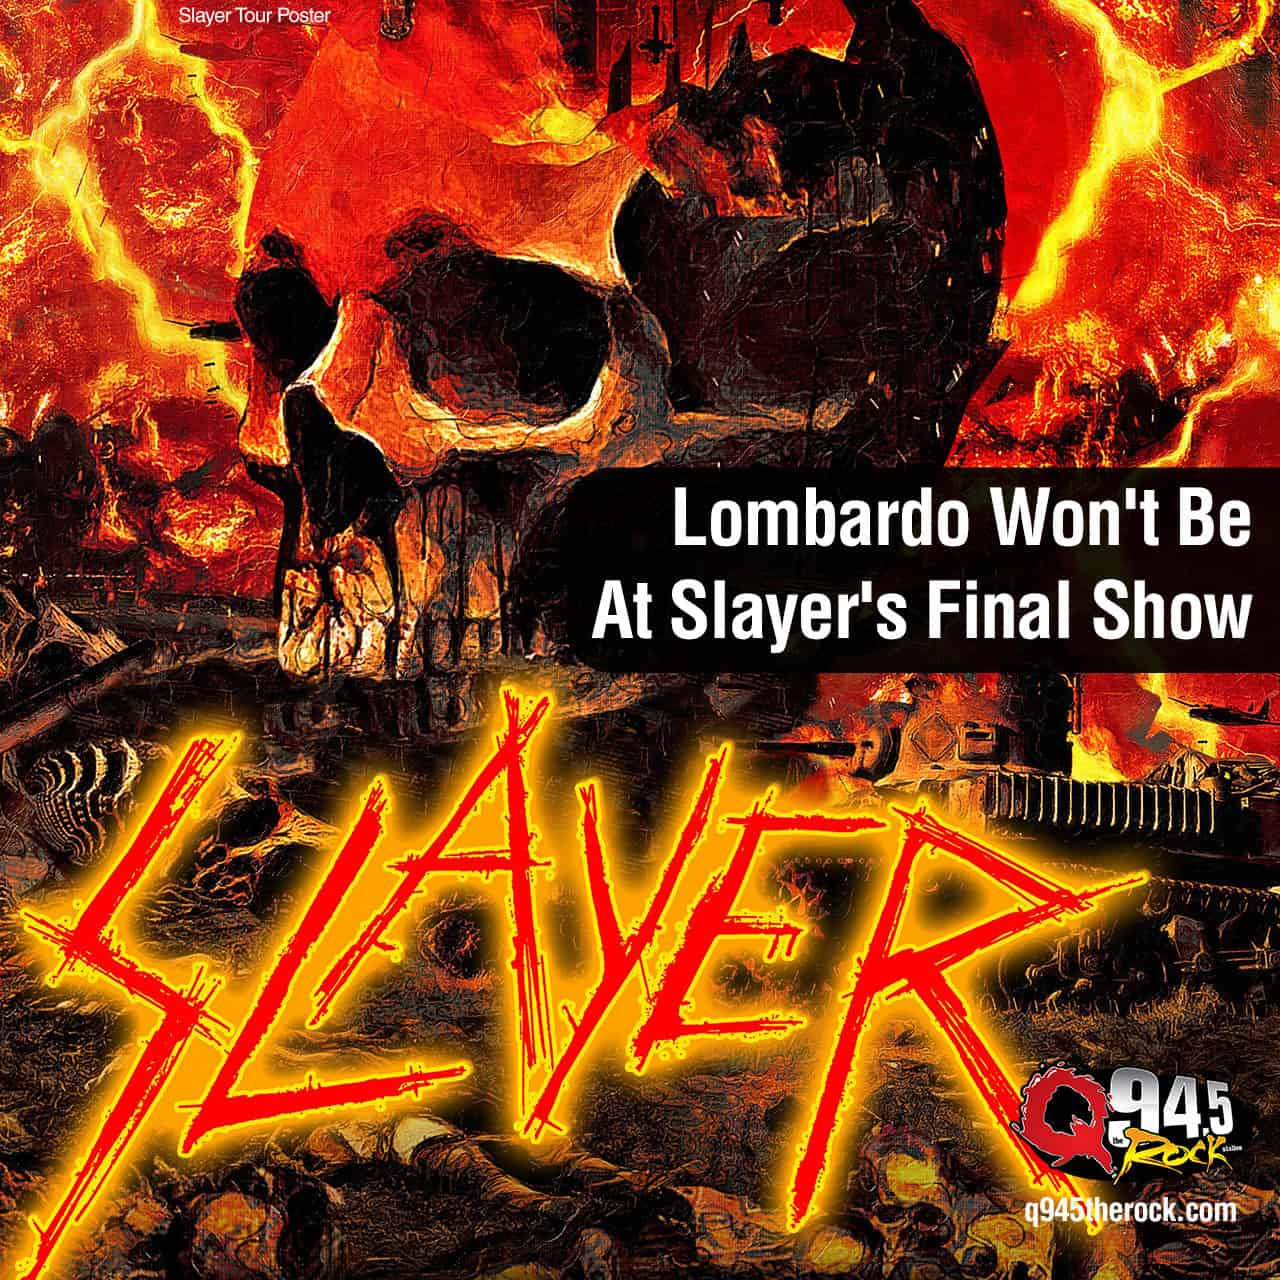 Lombardo Won't Be At Slayer's Final Show -  KFRQ Q94.5